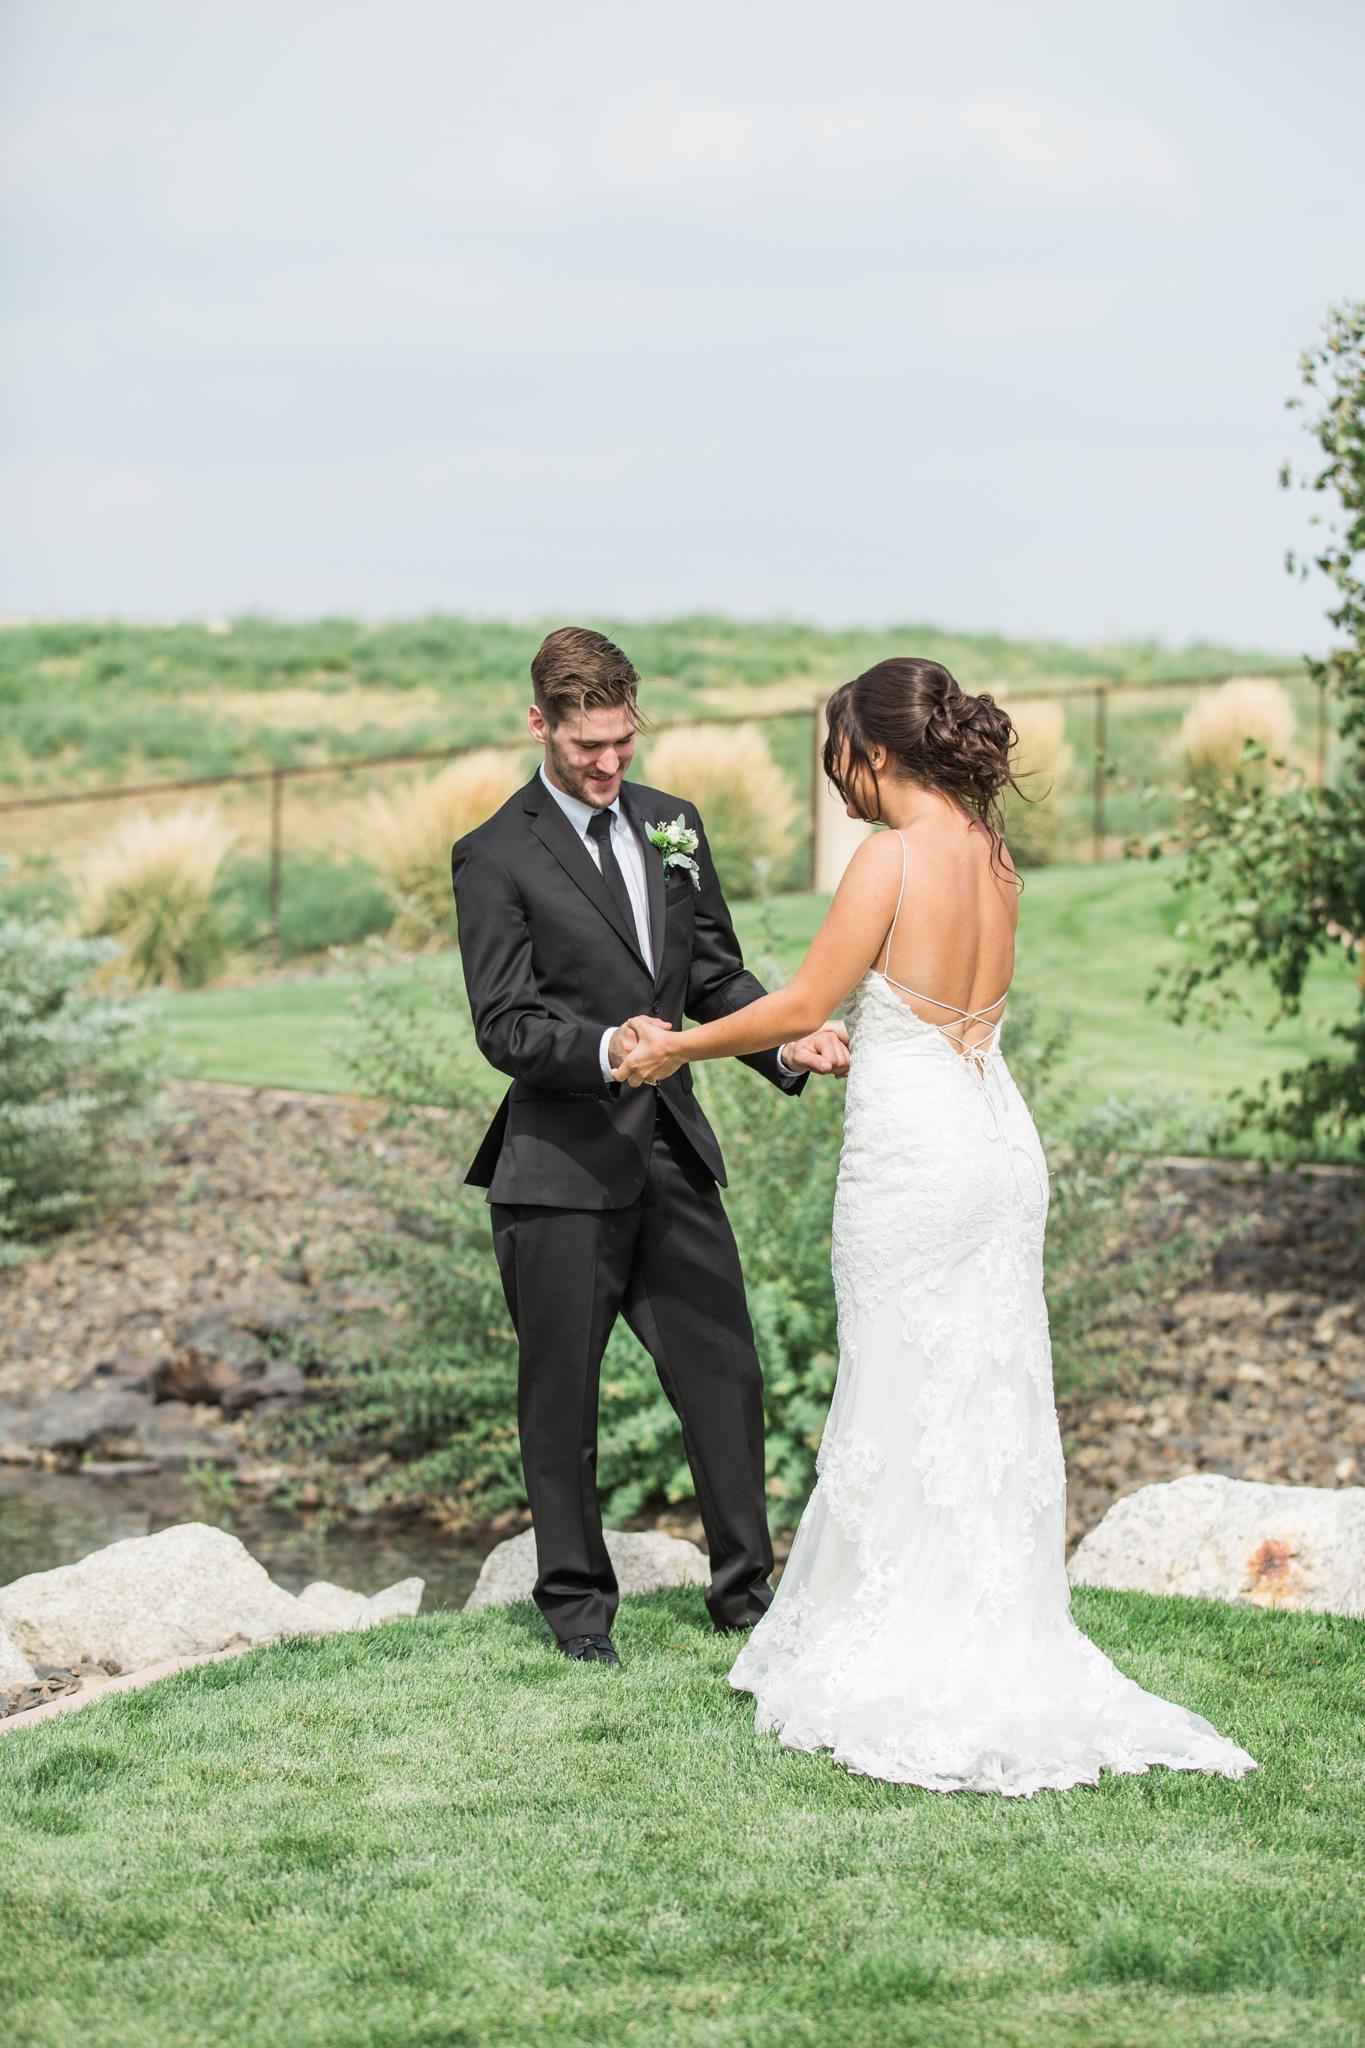 Olga_janni_wedding_090917_WEBSIZE (140 of 704).JPG